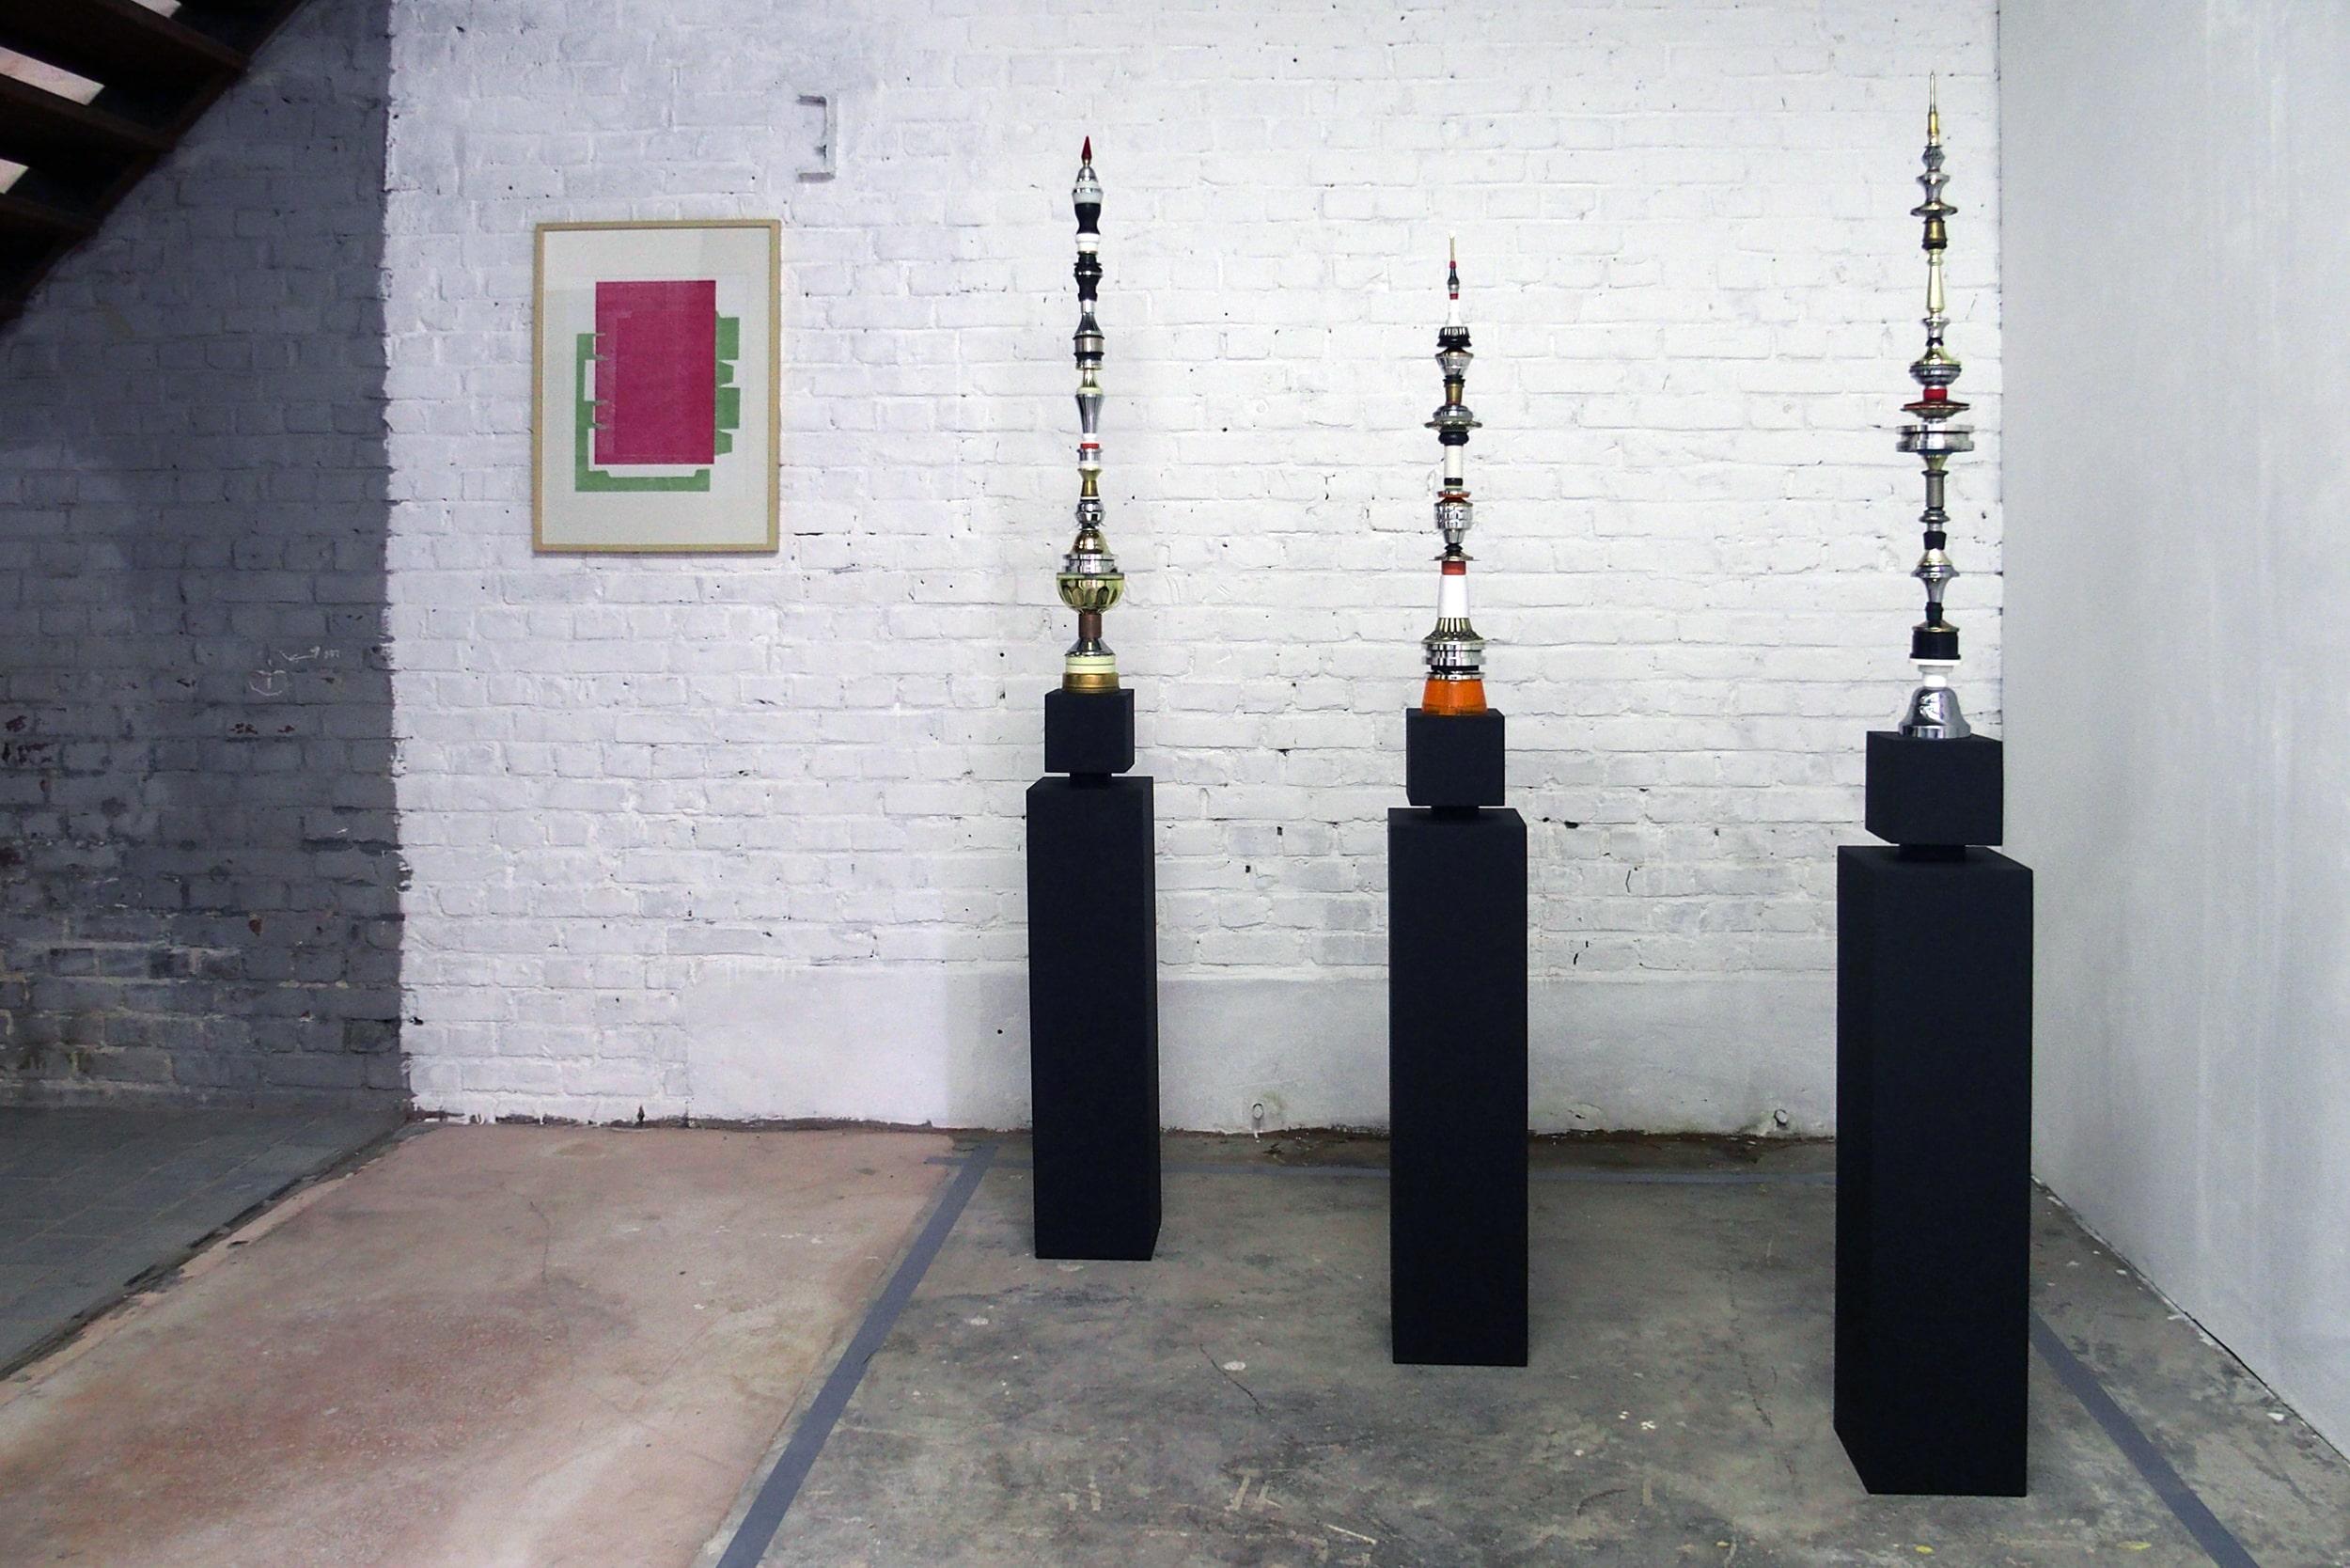 Stéphane Laurent Marcel sculptures, Sophie Wirtz gravures